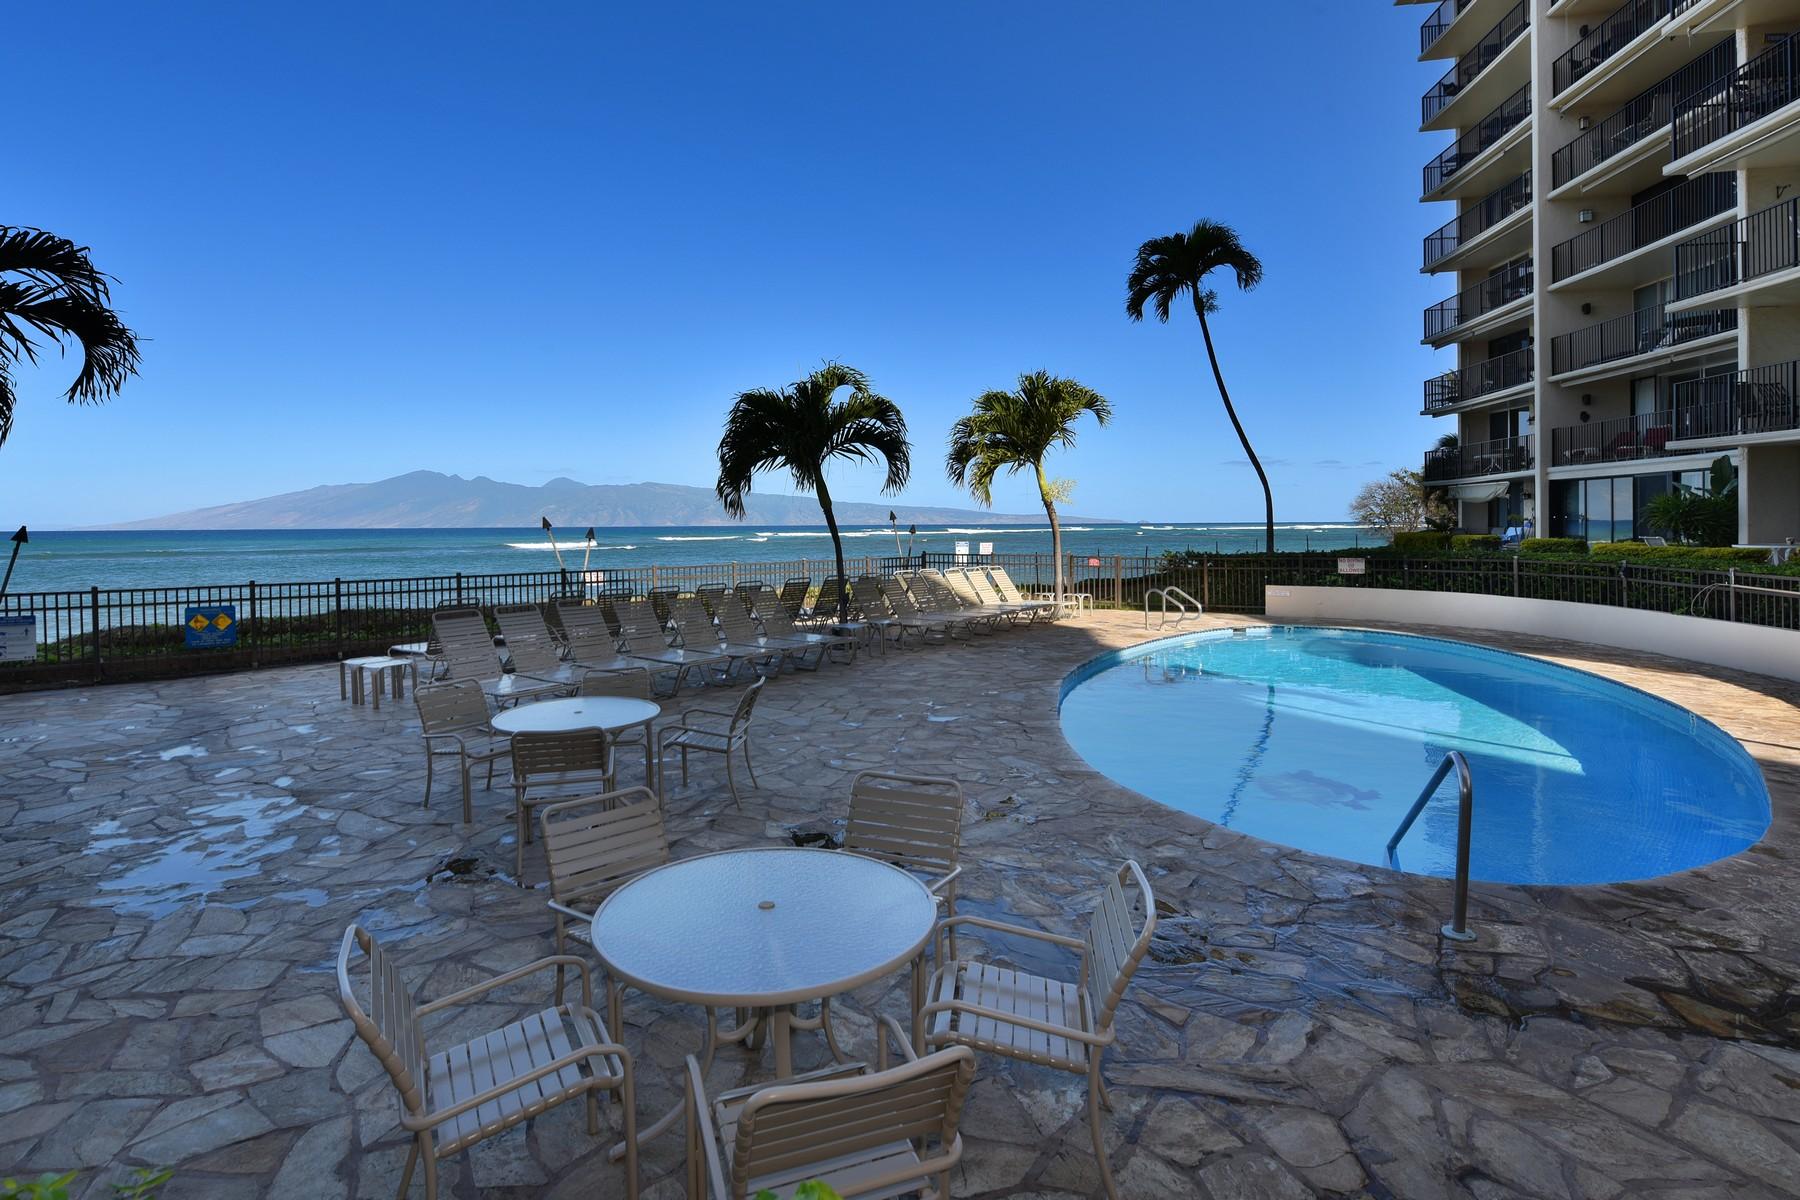 Nhà chung cư vì Bán tại Paradise Found 4401 Lower Honoapiilani Road, Hololani A104 Kahana, Hawaii, 96761 Hoa Kỳ